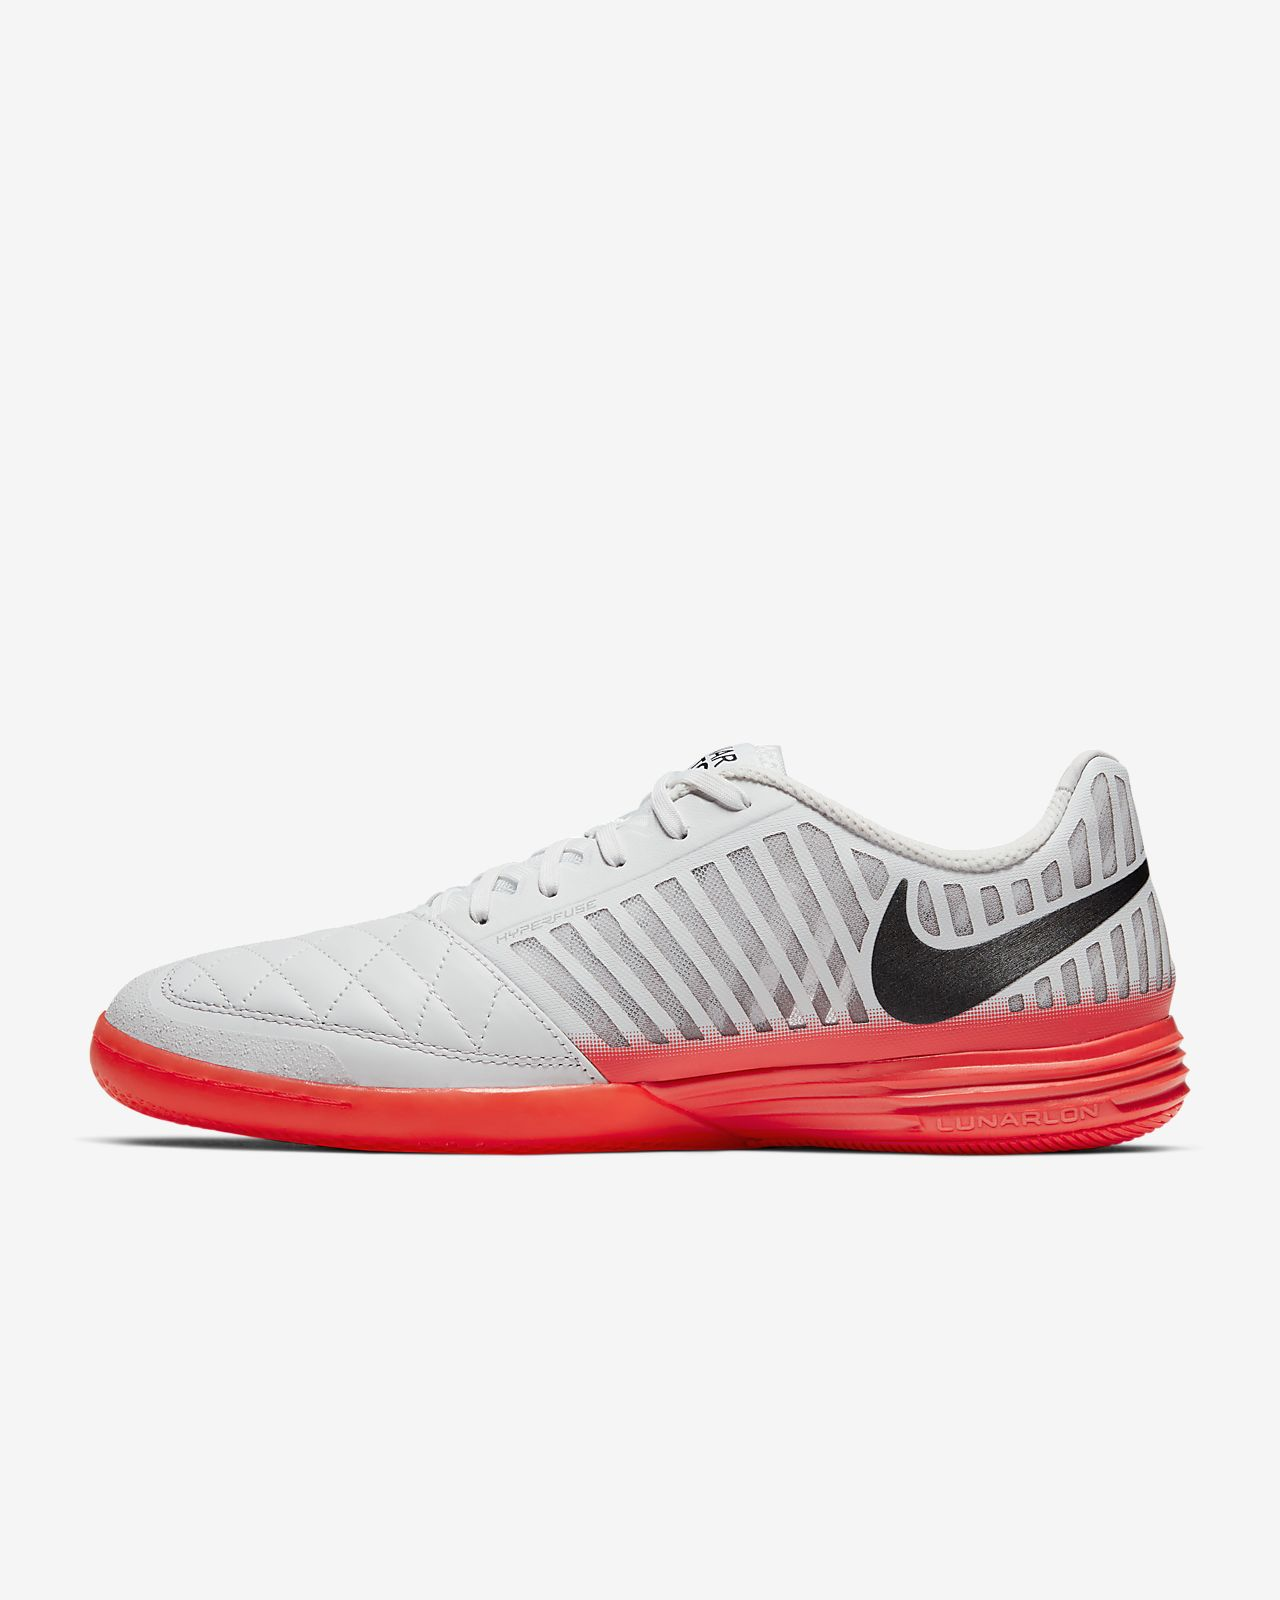 Chaussure De Football En Salle Nike Lunar Gato Ii Ic Nike Fr